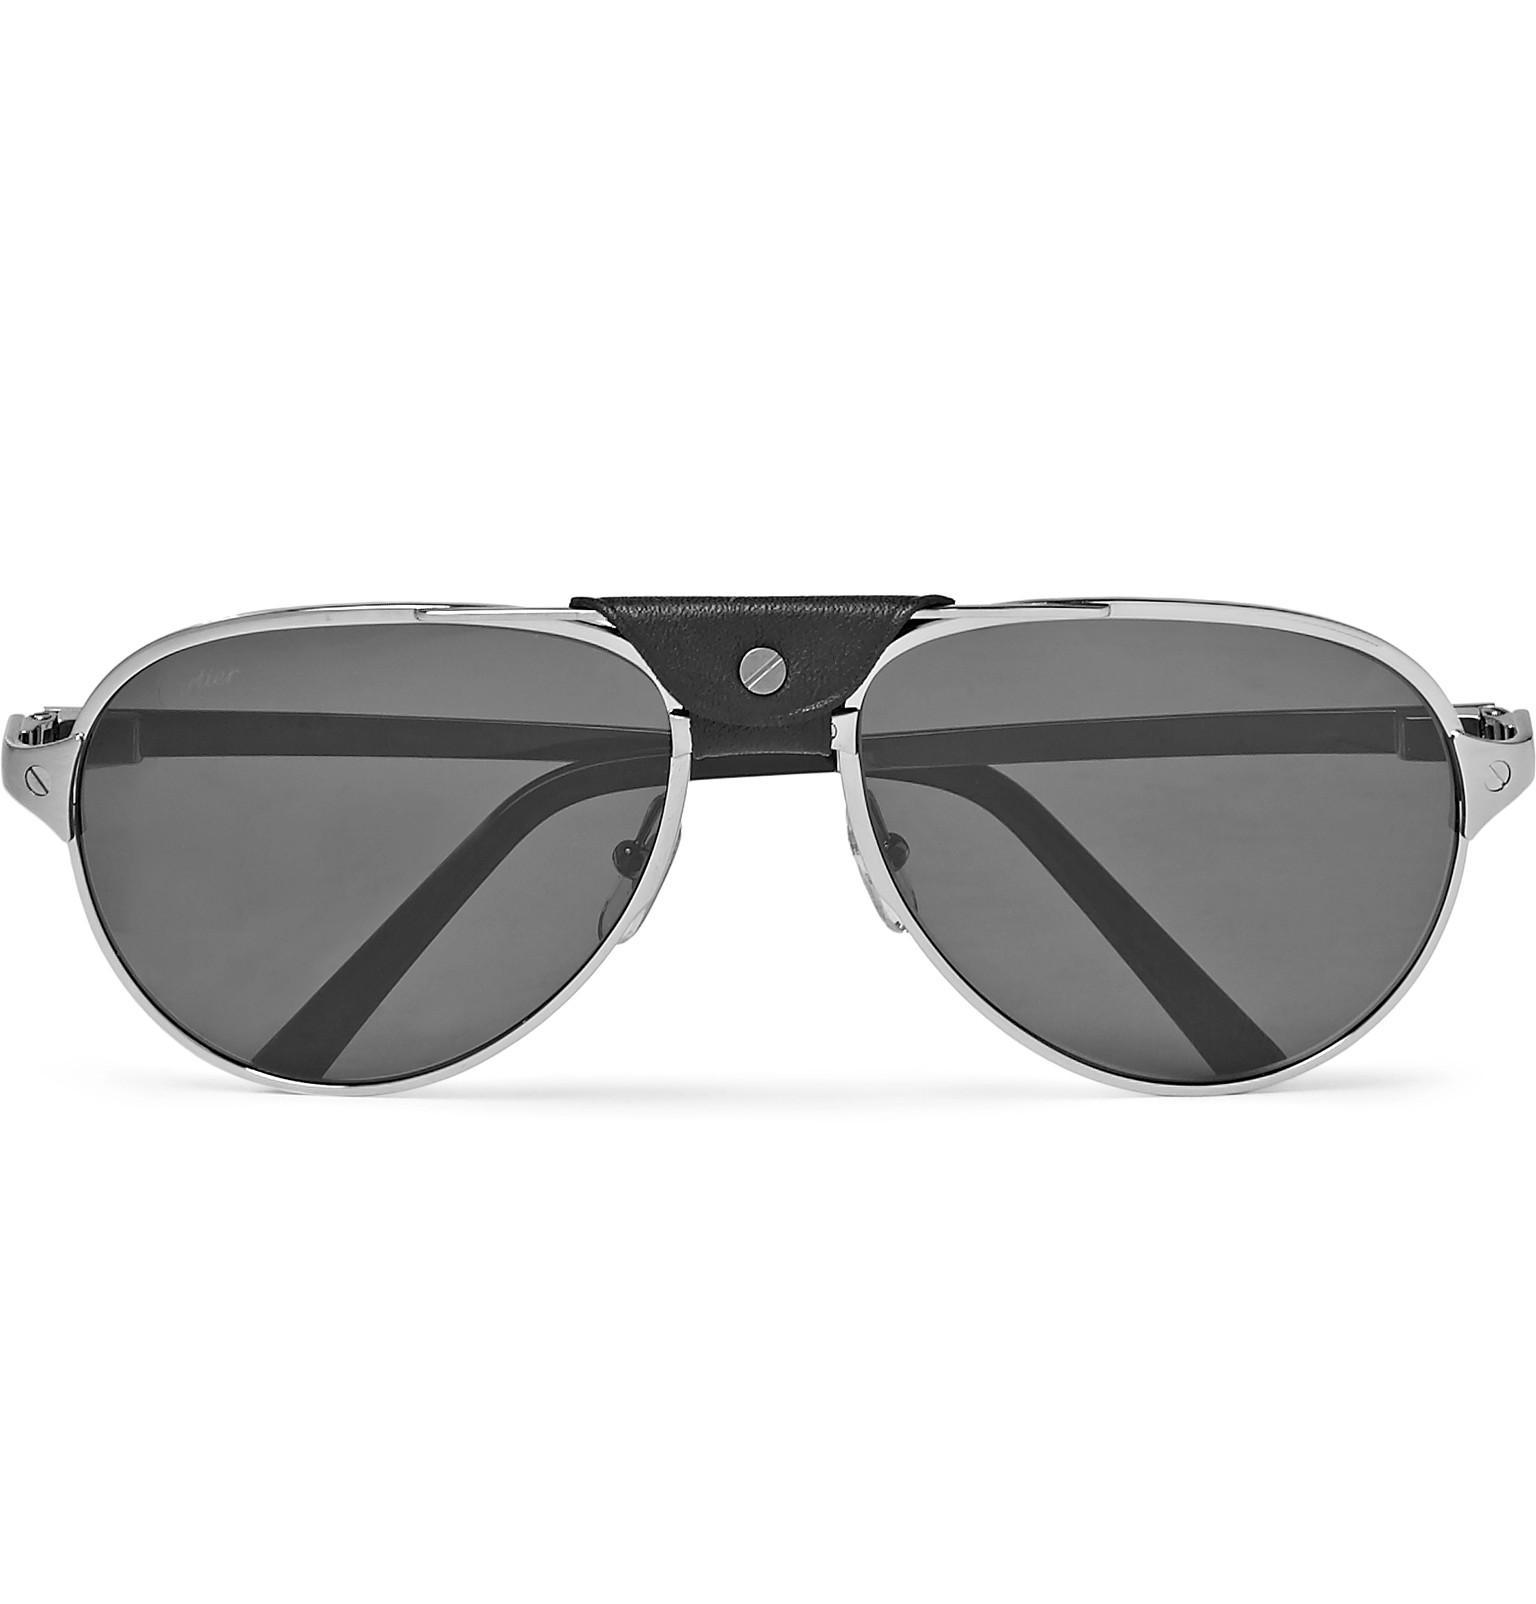 f9c1af85d8 Lyst - Cartier Santos De Cartier Aviator-style Leather-trimmed ...